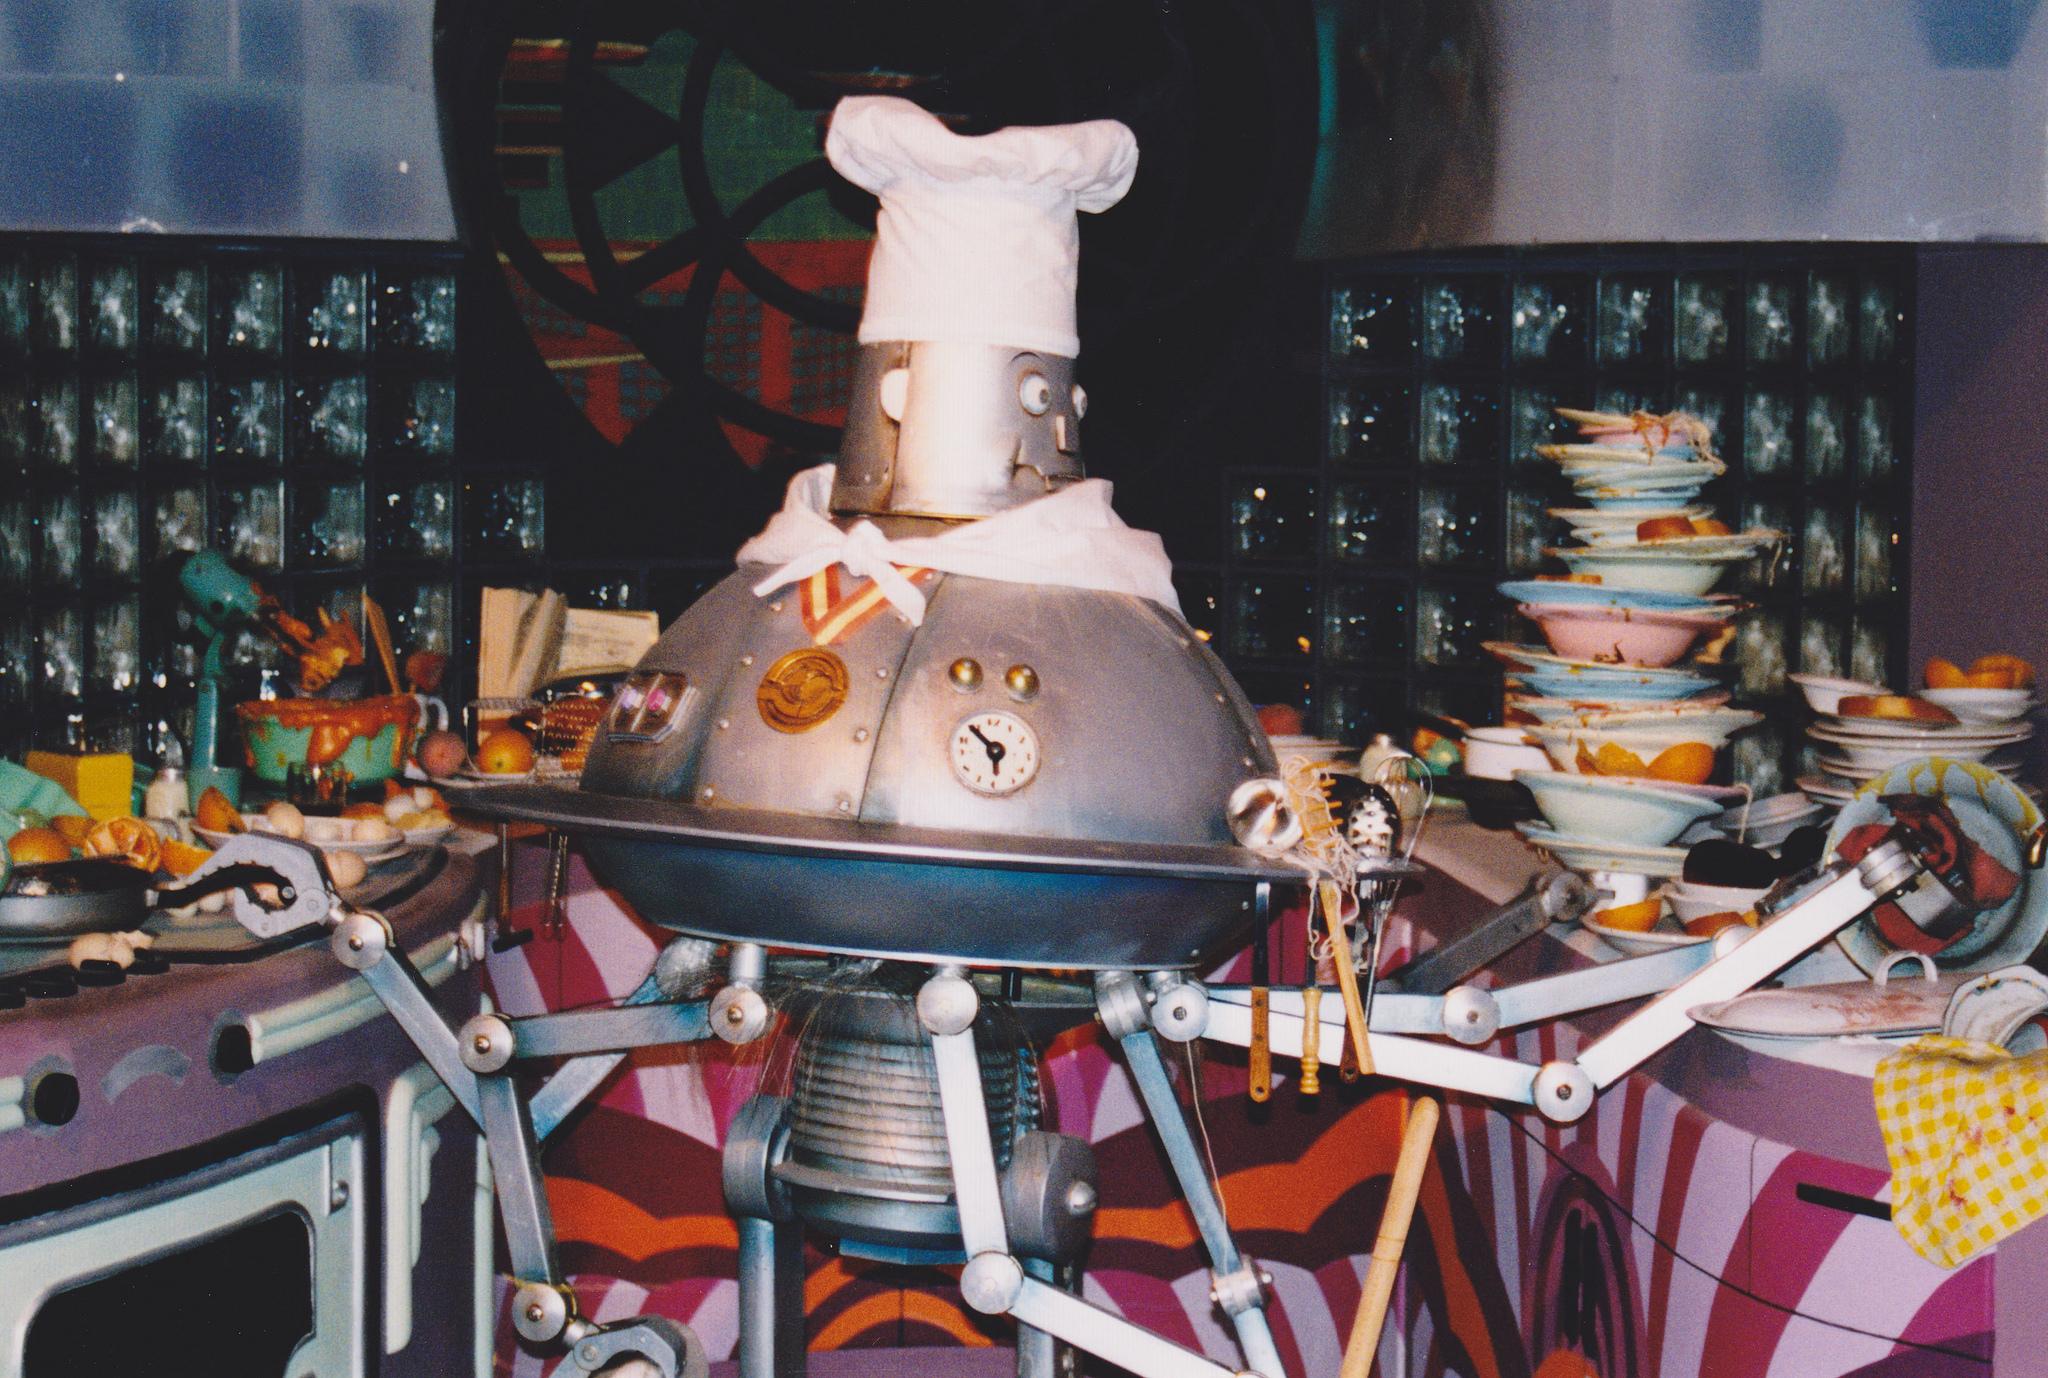 Food Robots on the Menu of CMU-Sony Collaboration